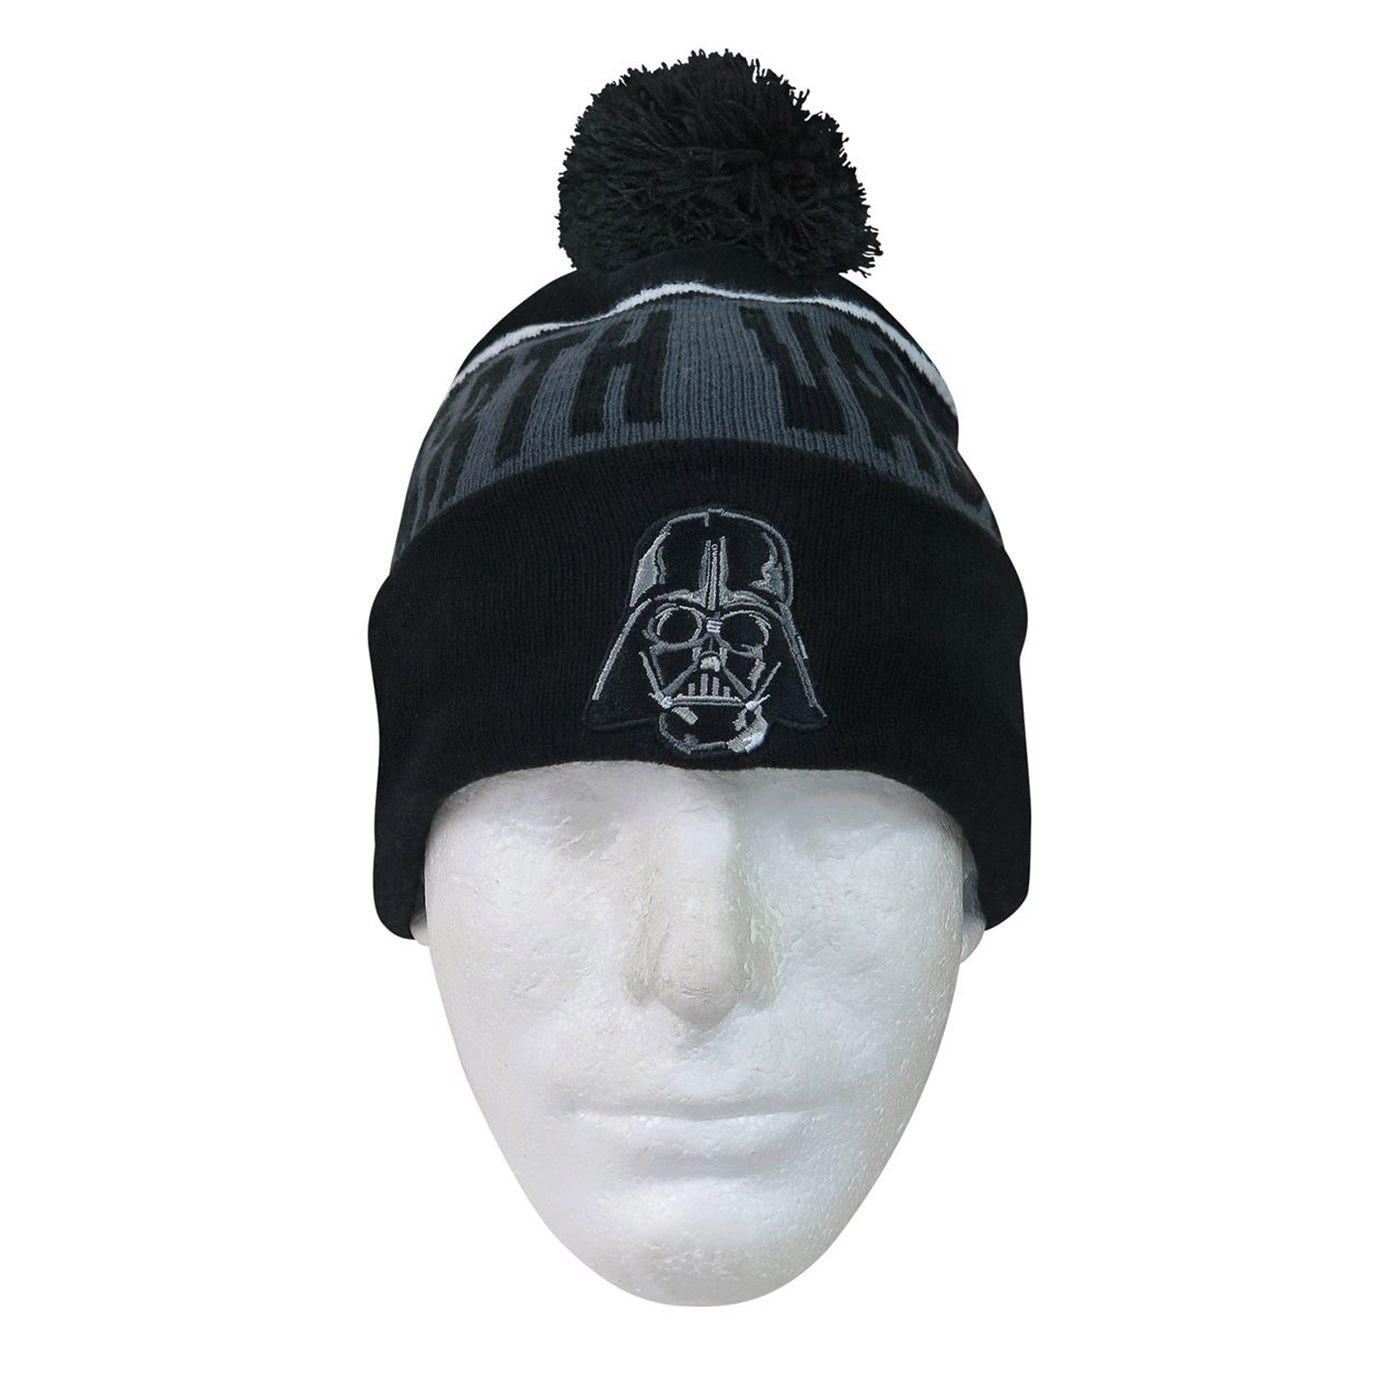 Star Wars Darth Vader Fleece Lined Pom Pom Beanie